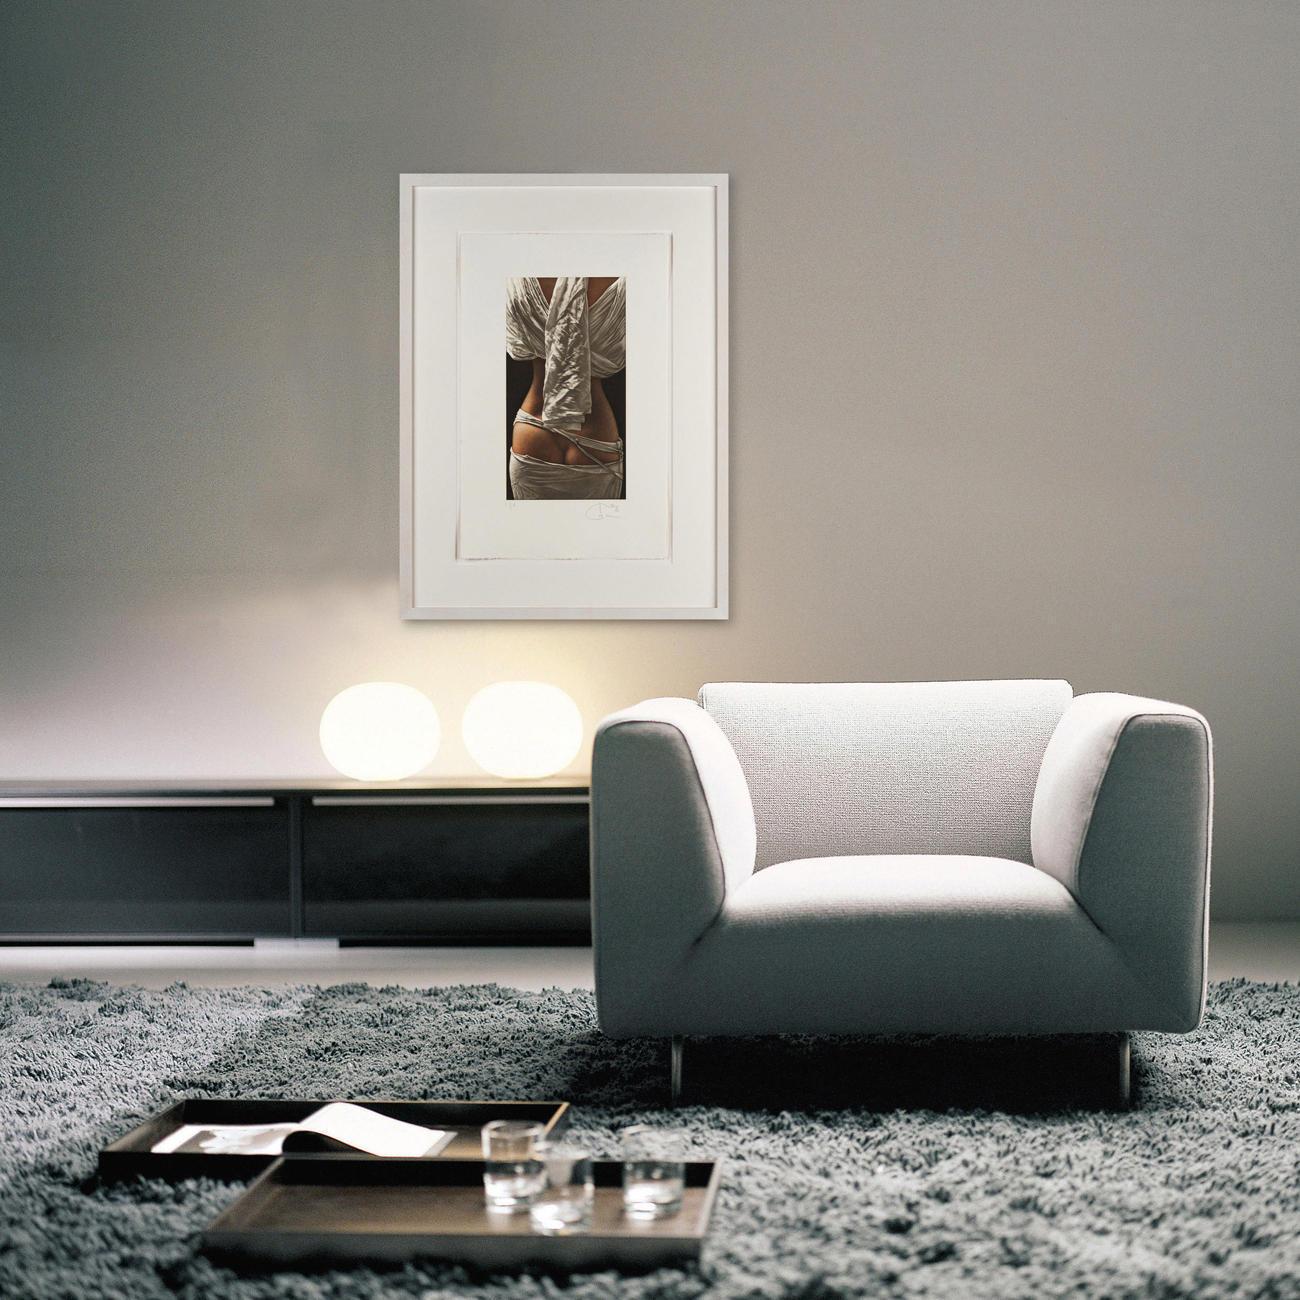 willi kissmer r ckenakt kaufen pro idee kunstformat. Black Bedroom Furniture Sets. Home Design Ideas